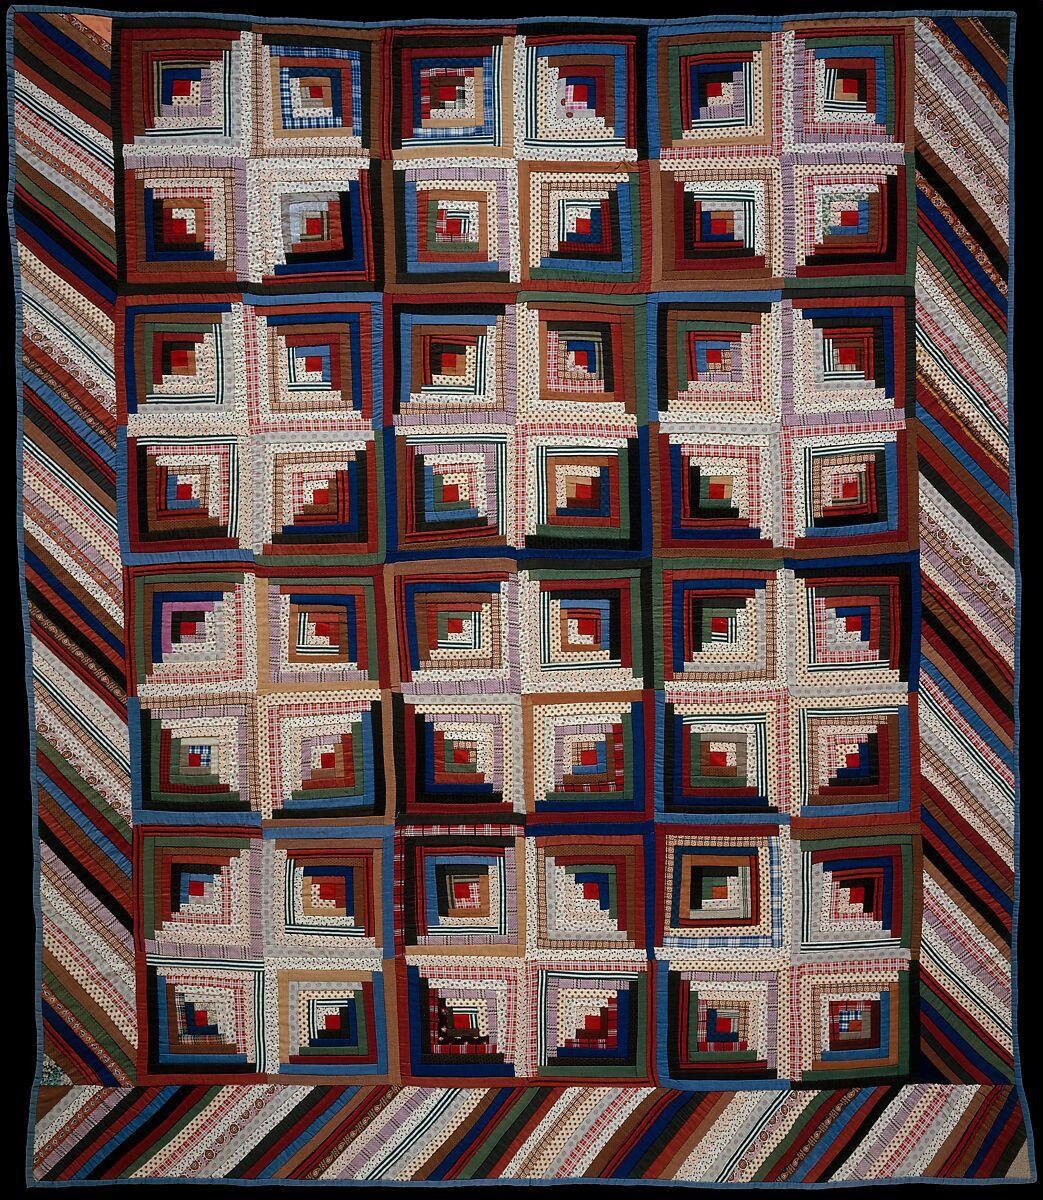 Quilt Log Cabin Pattern Light And Dark Variation American The Metropolitan Museum Of Art